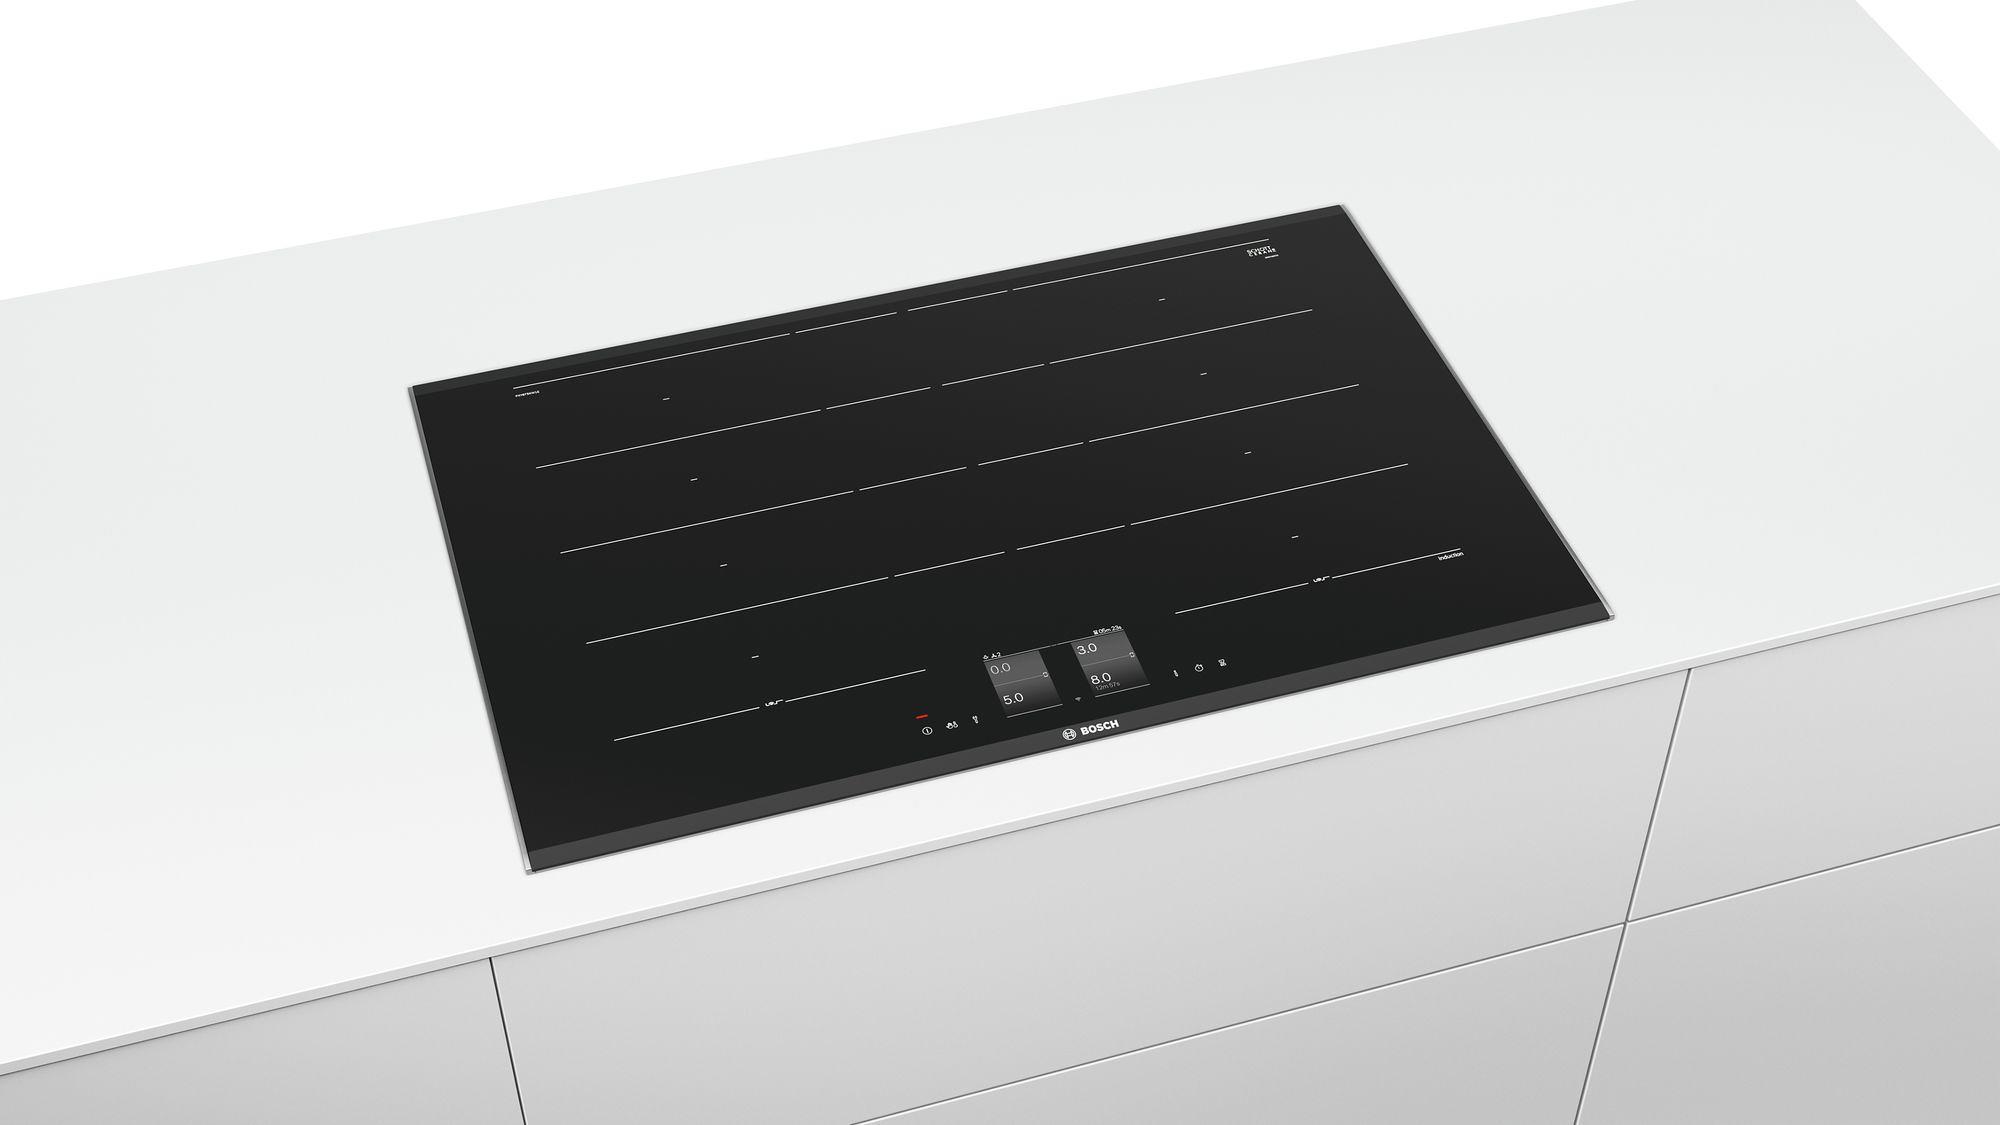 bosch pxy875kw1e autarkes induktions kochfeld glaskeramik alu rahmen silber 80 cm breit. Black Bedroom Furniture Sets. Home Design Ideas